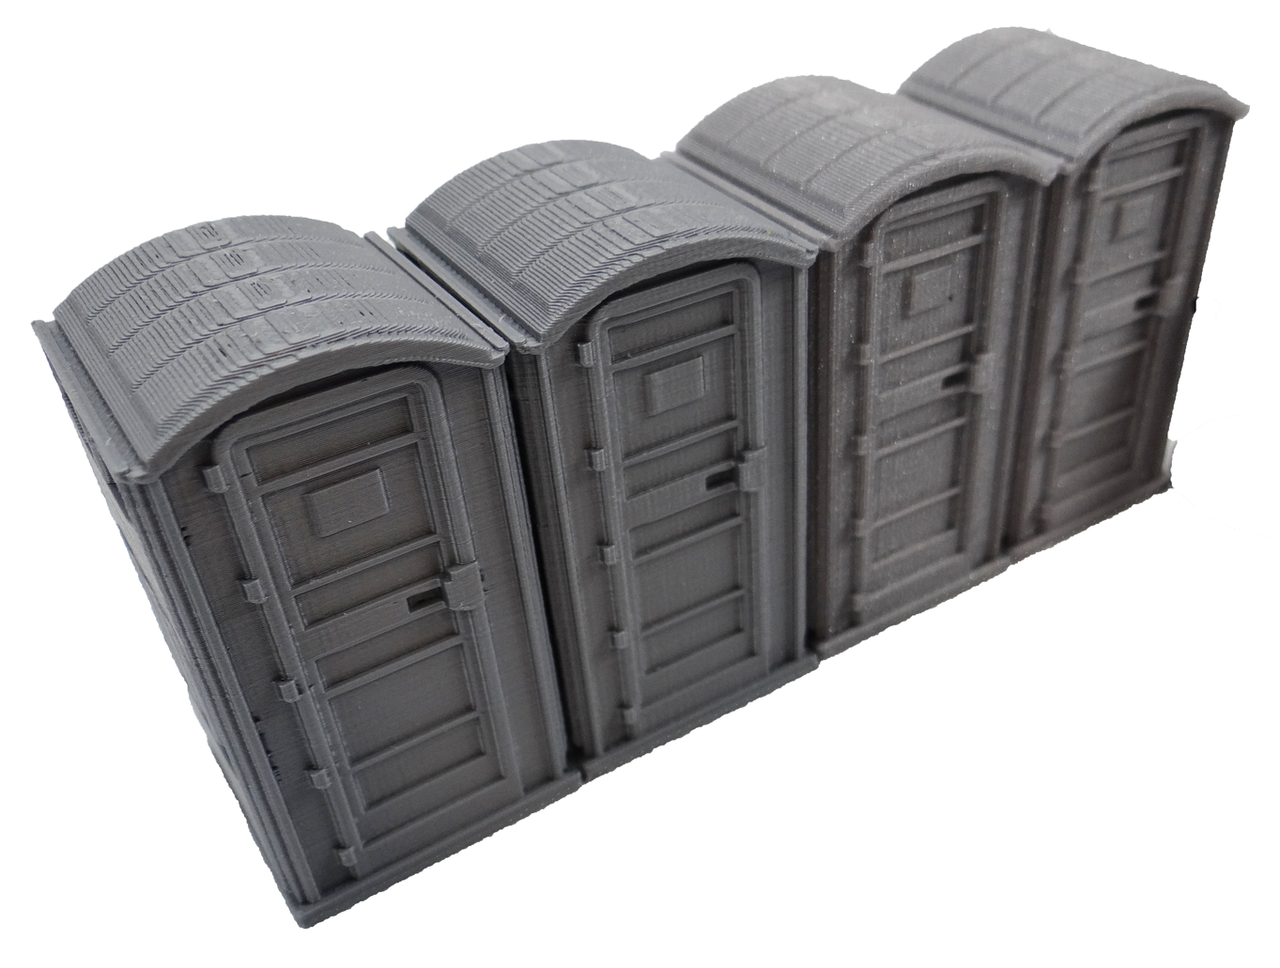 28mm Modern Porta Potty right angle view